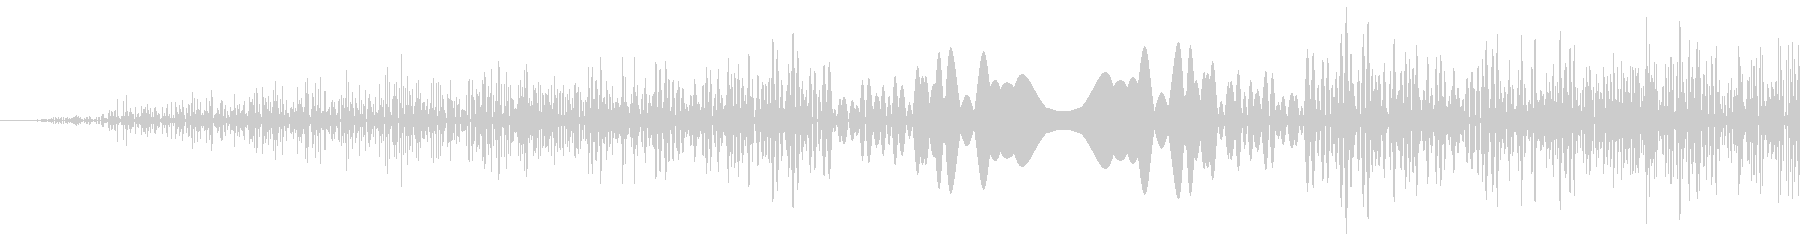 DJプレイ スクラッチ・ノイズ 3 短の未再生の波形